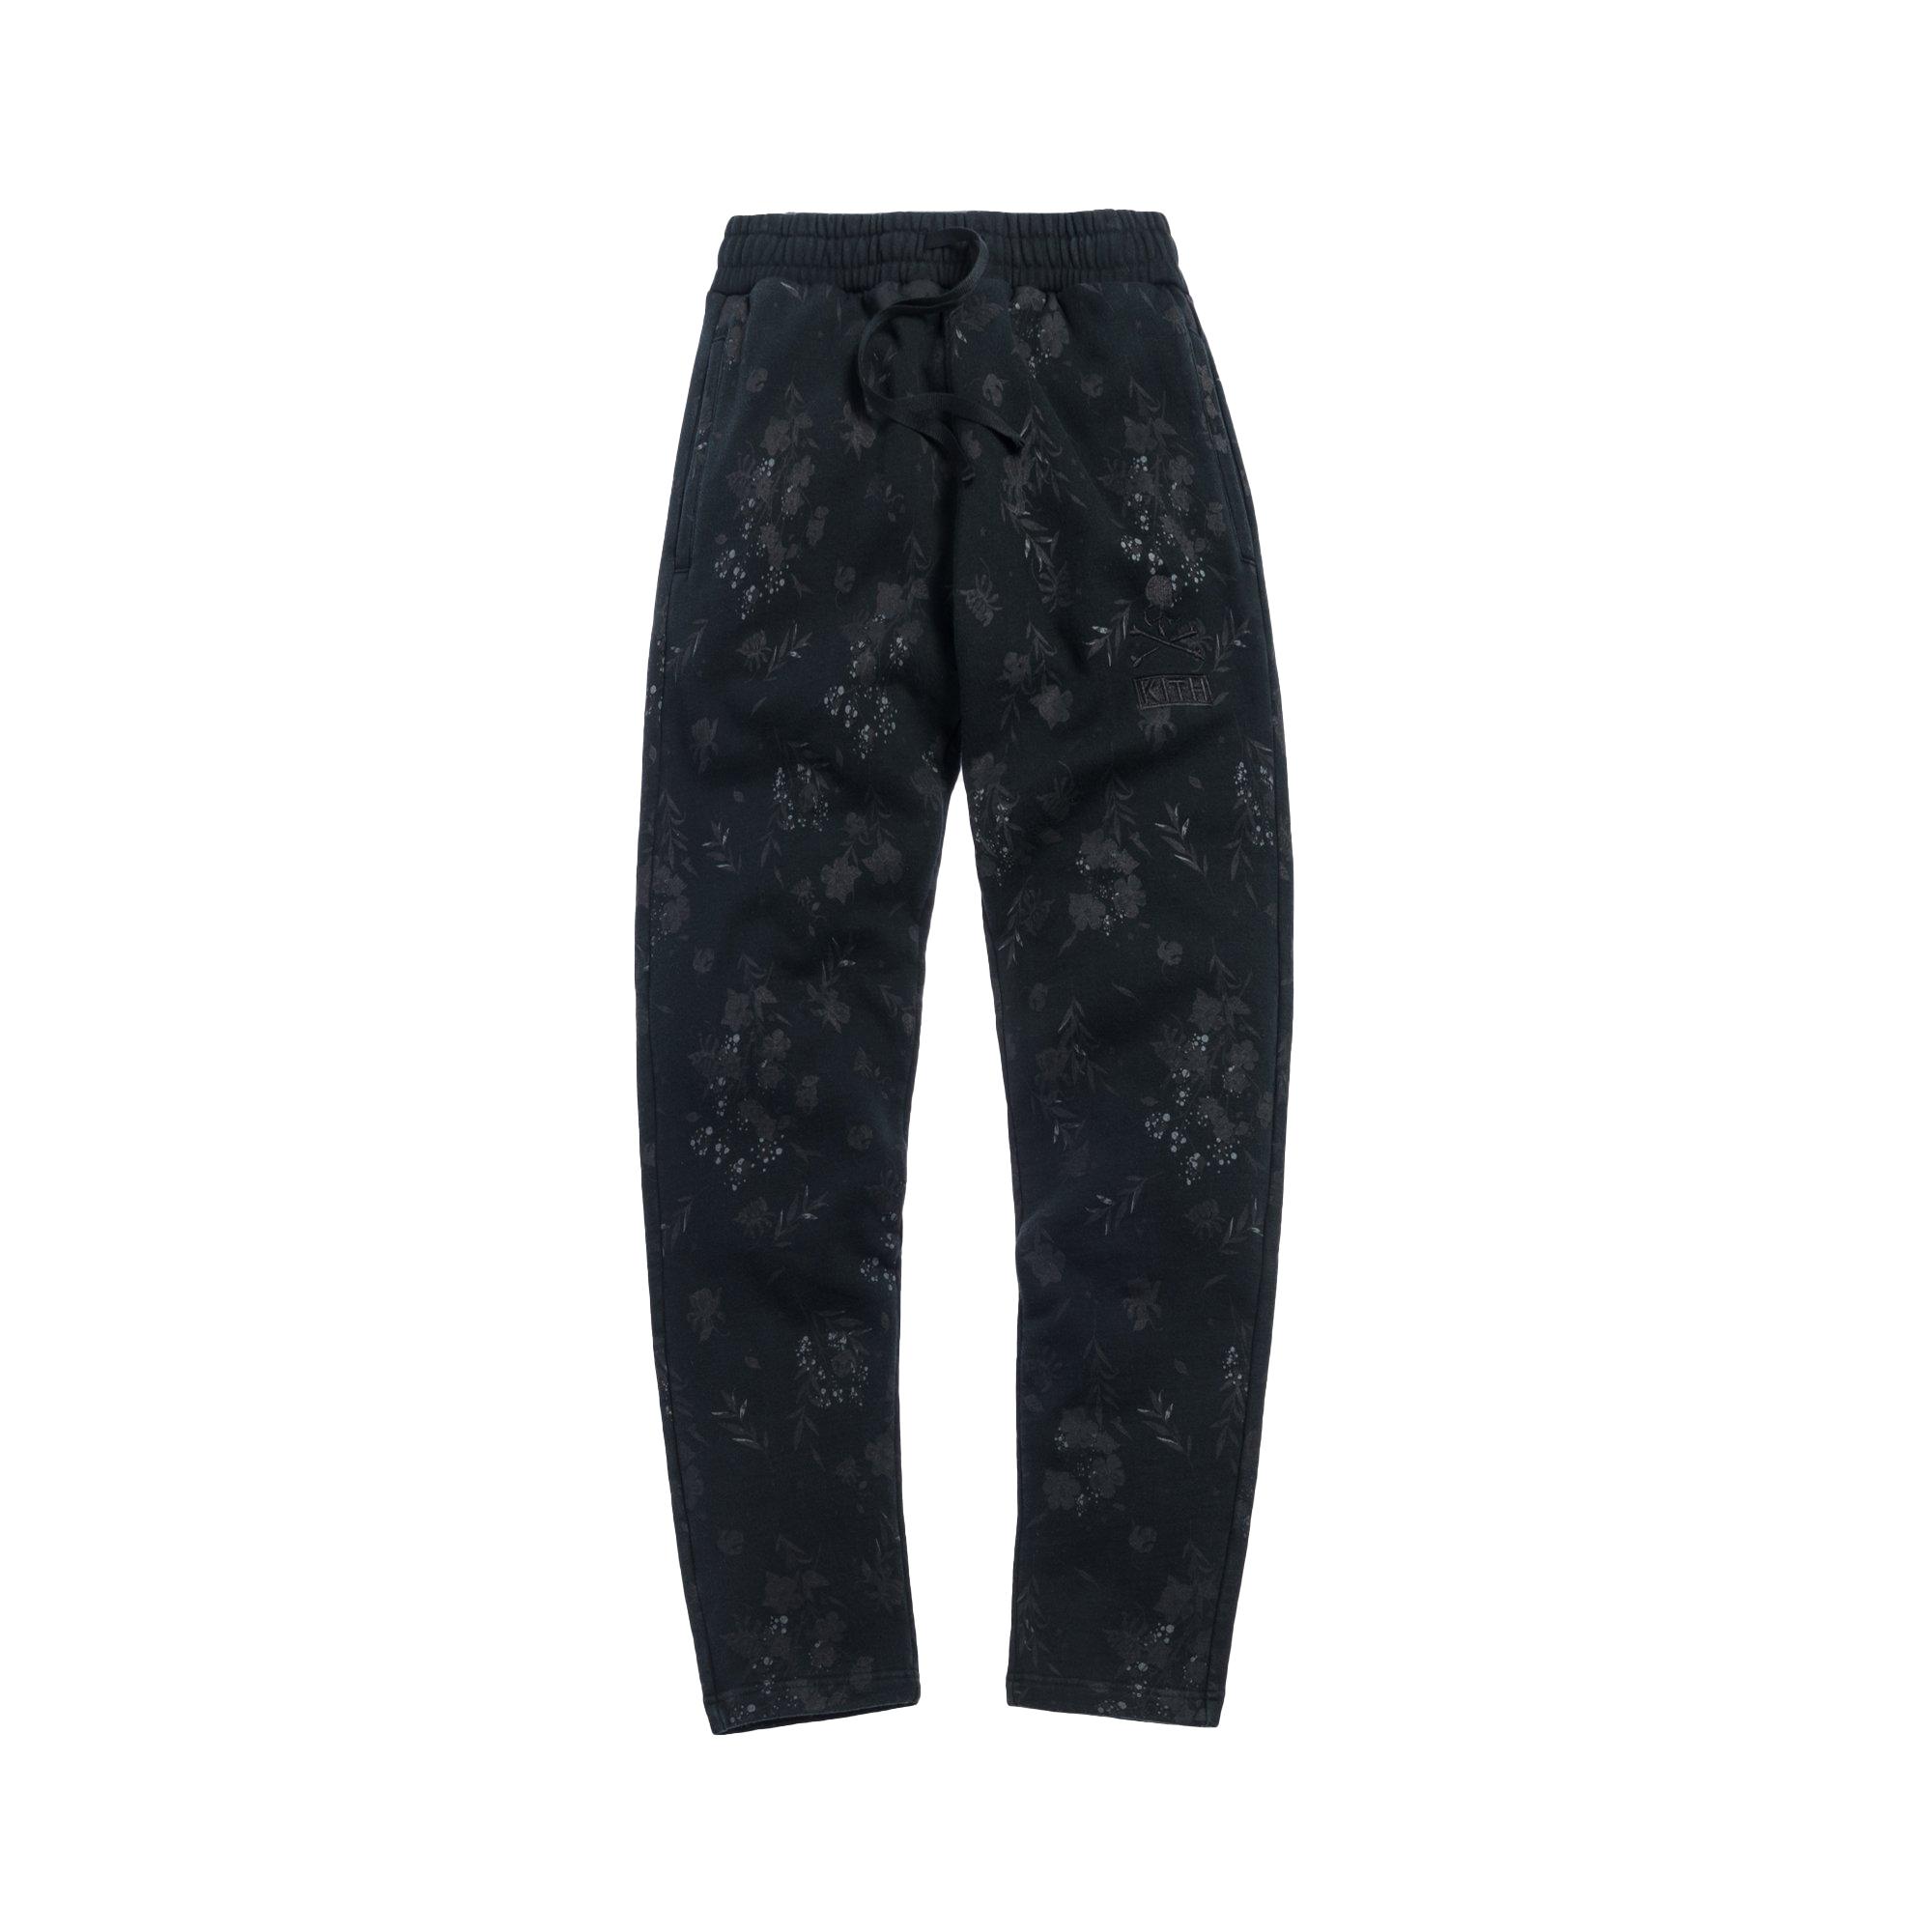 Kith x mastermind WORLD Fleece Sweatpants Black